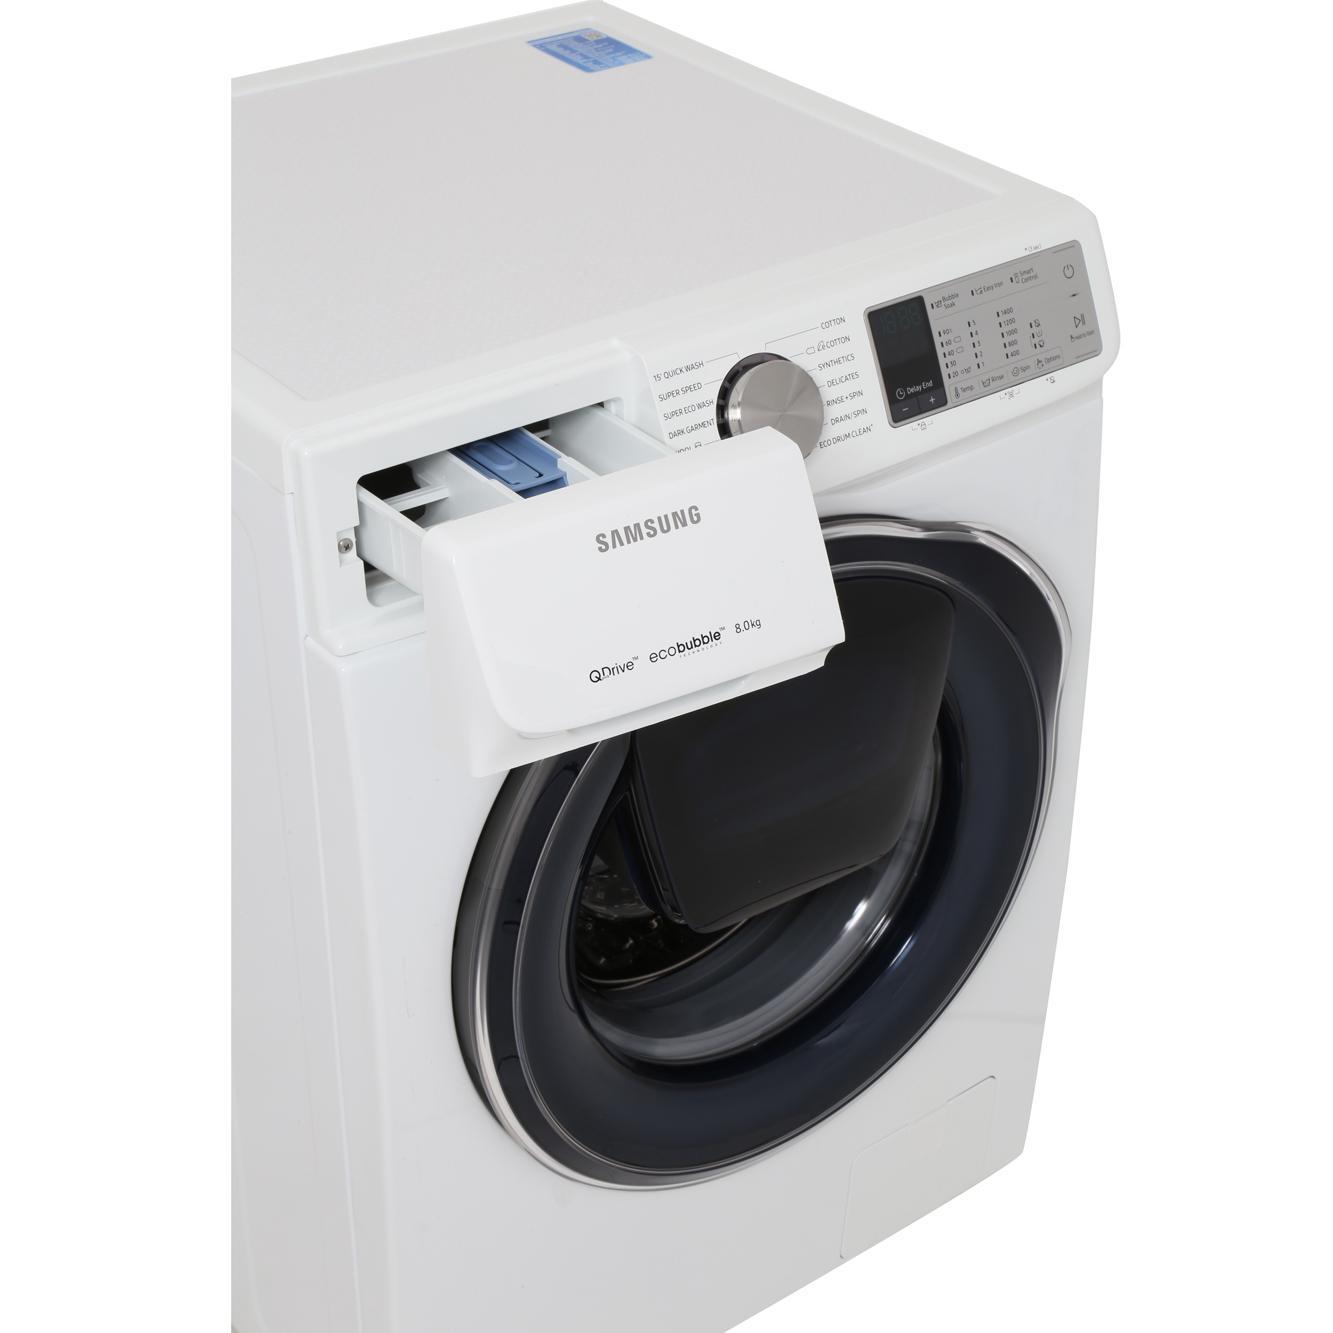 buy samsung quickdrive ww80m645opa 8 kg washing machine. Black Bedroom Furniture Sets. Home Design Ideas